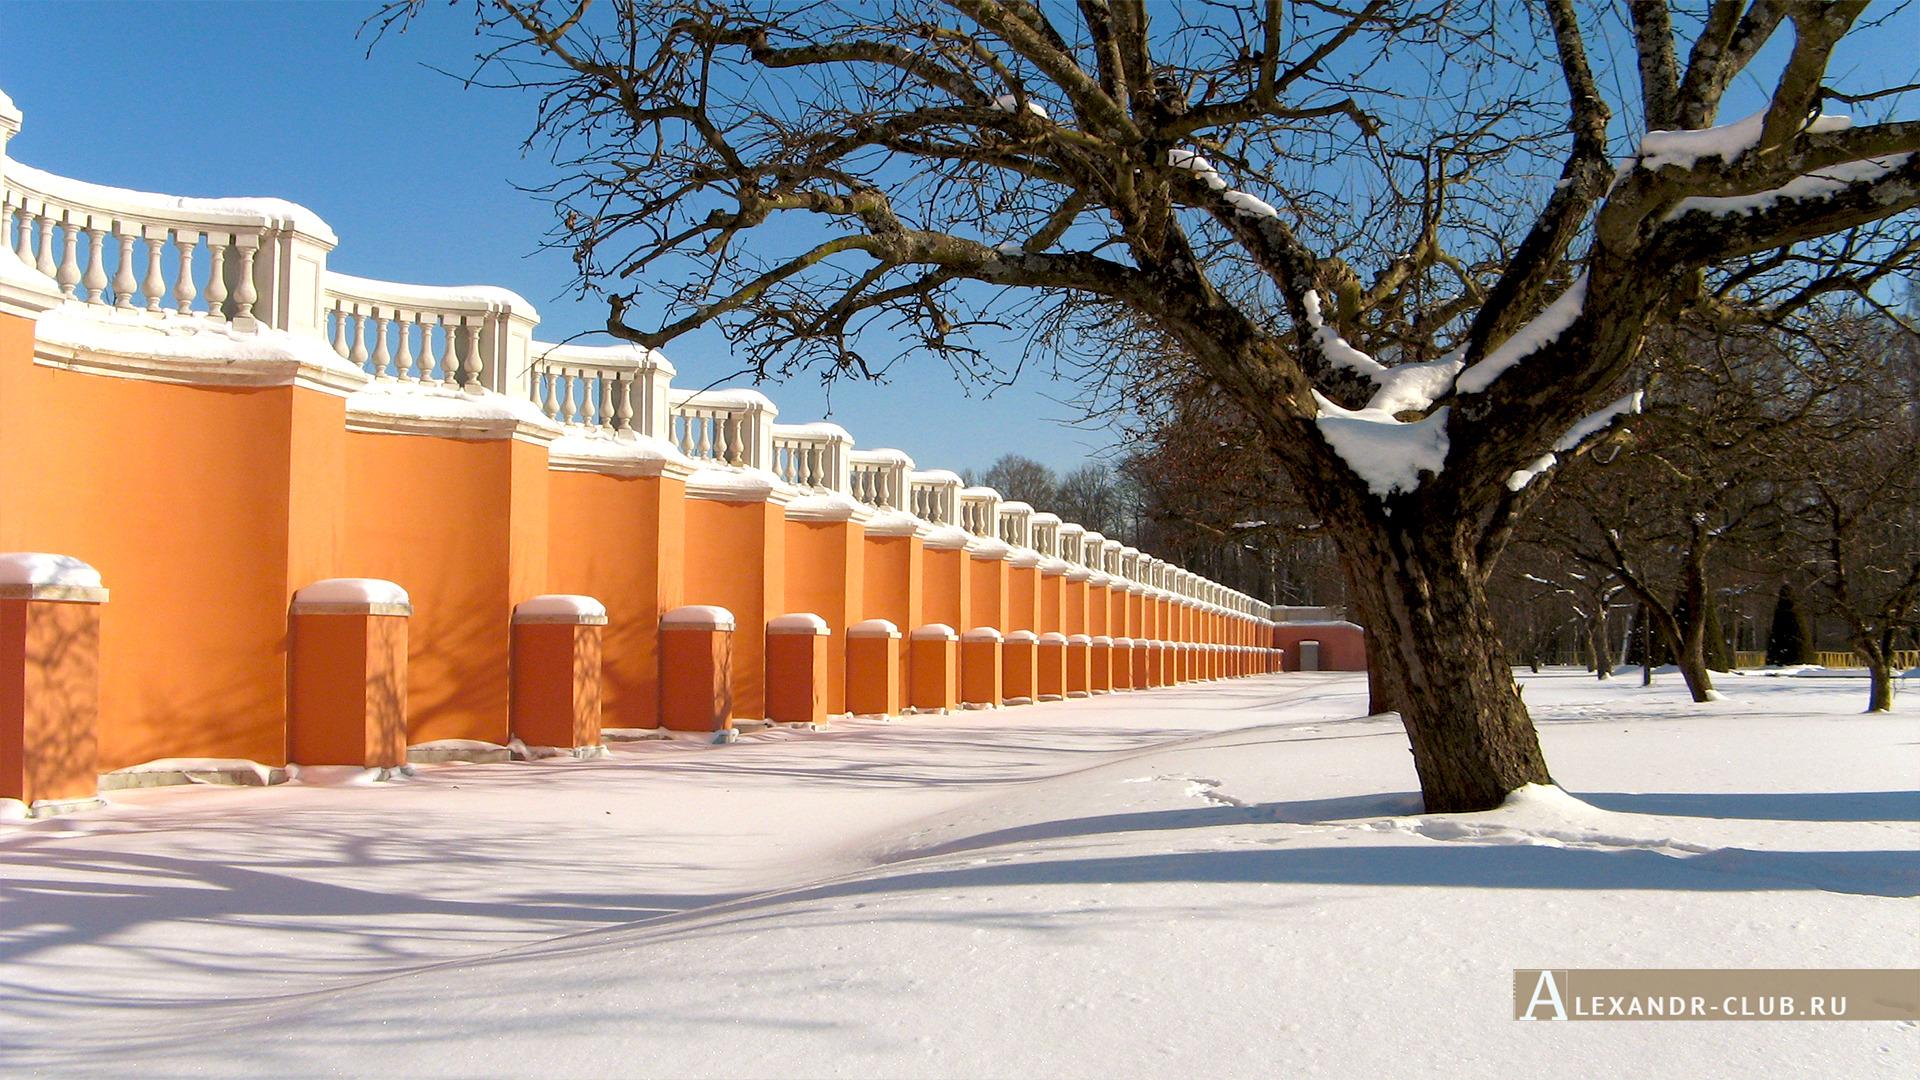 Петергоф, зима, Нижний парк, Марлинский вал – 2